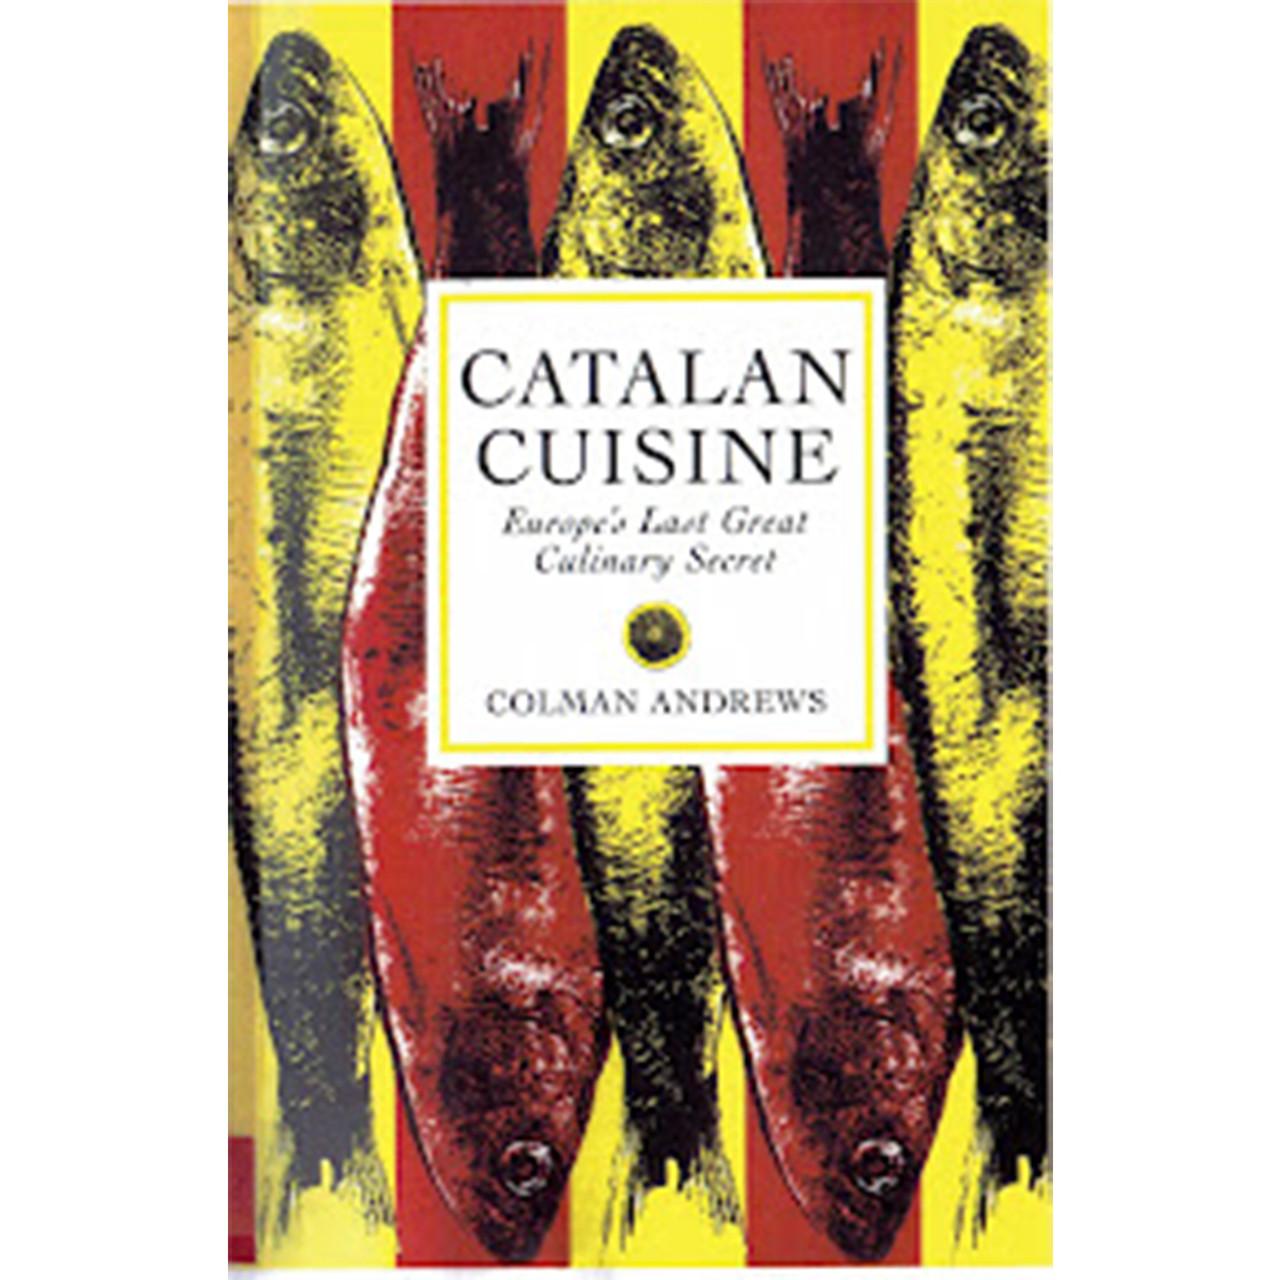 Catalan Cuisine - Colman Andrews